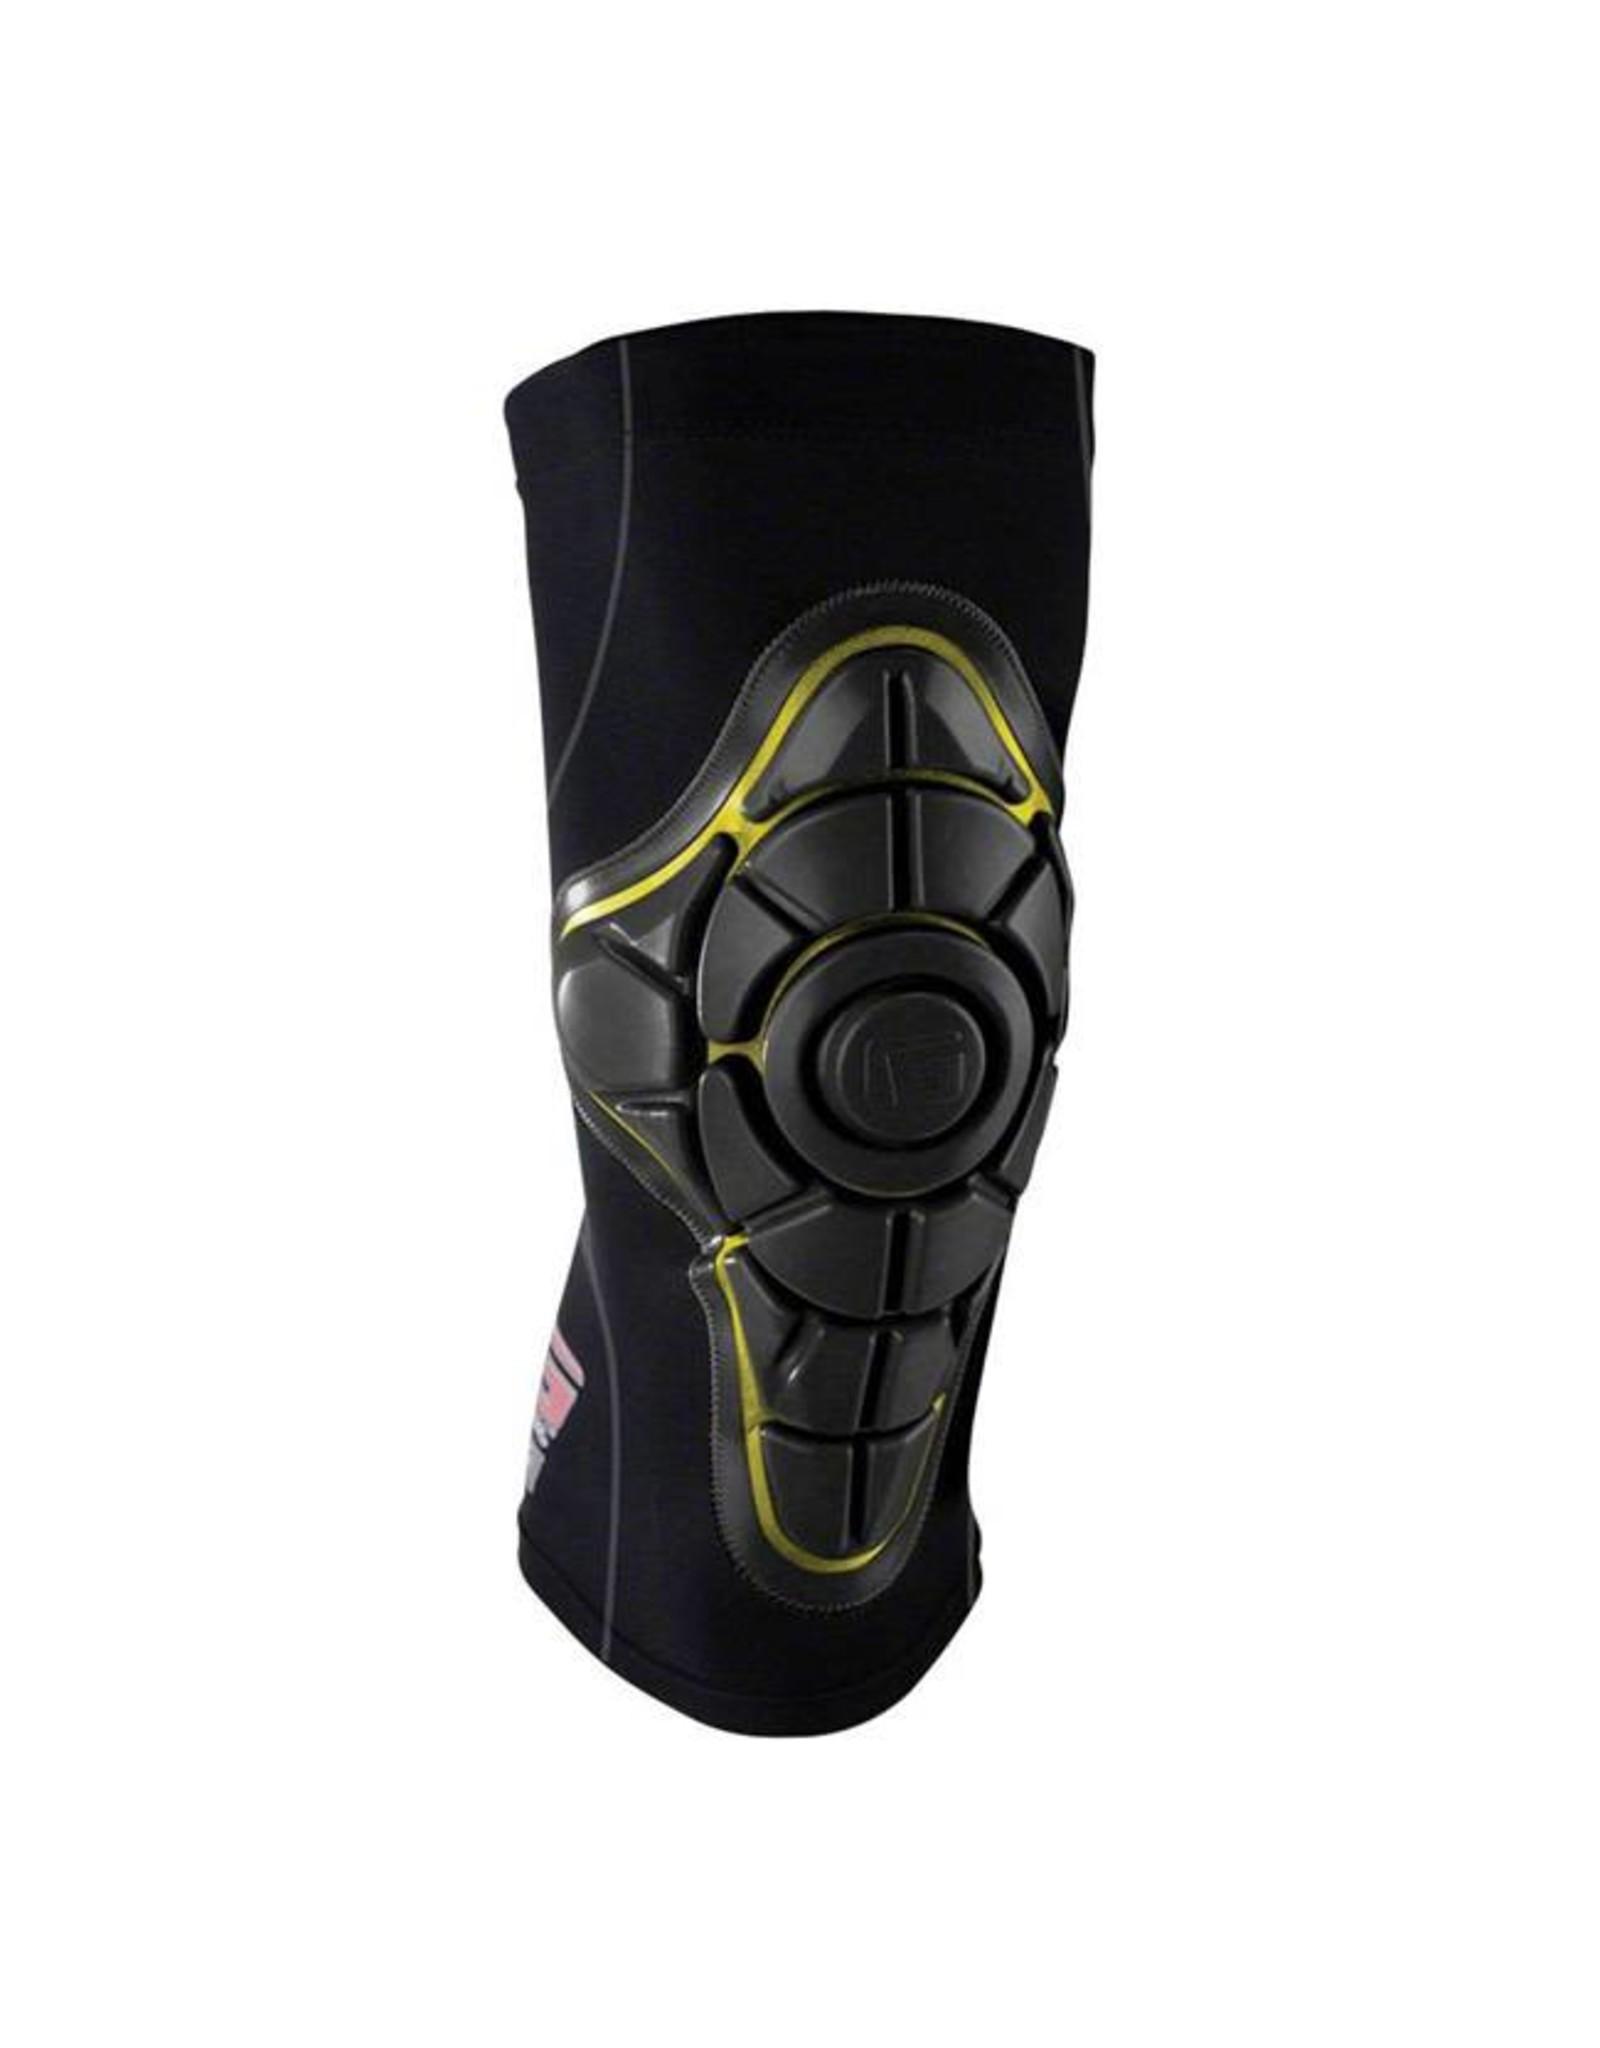 G-Form G-Form Pro-X Knee Pad: Black/Yellow LG